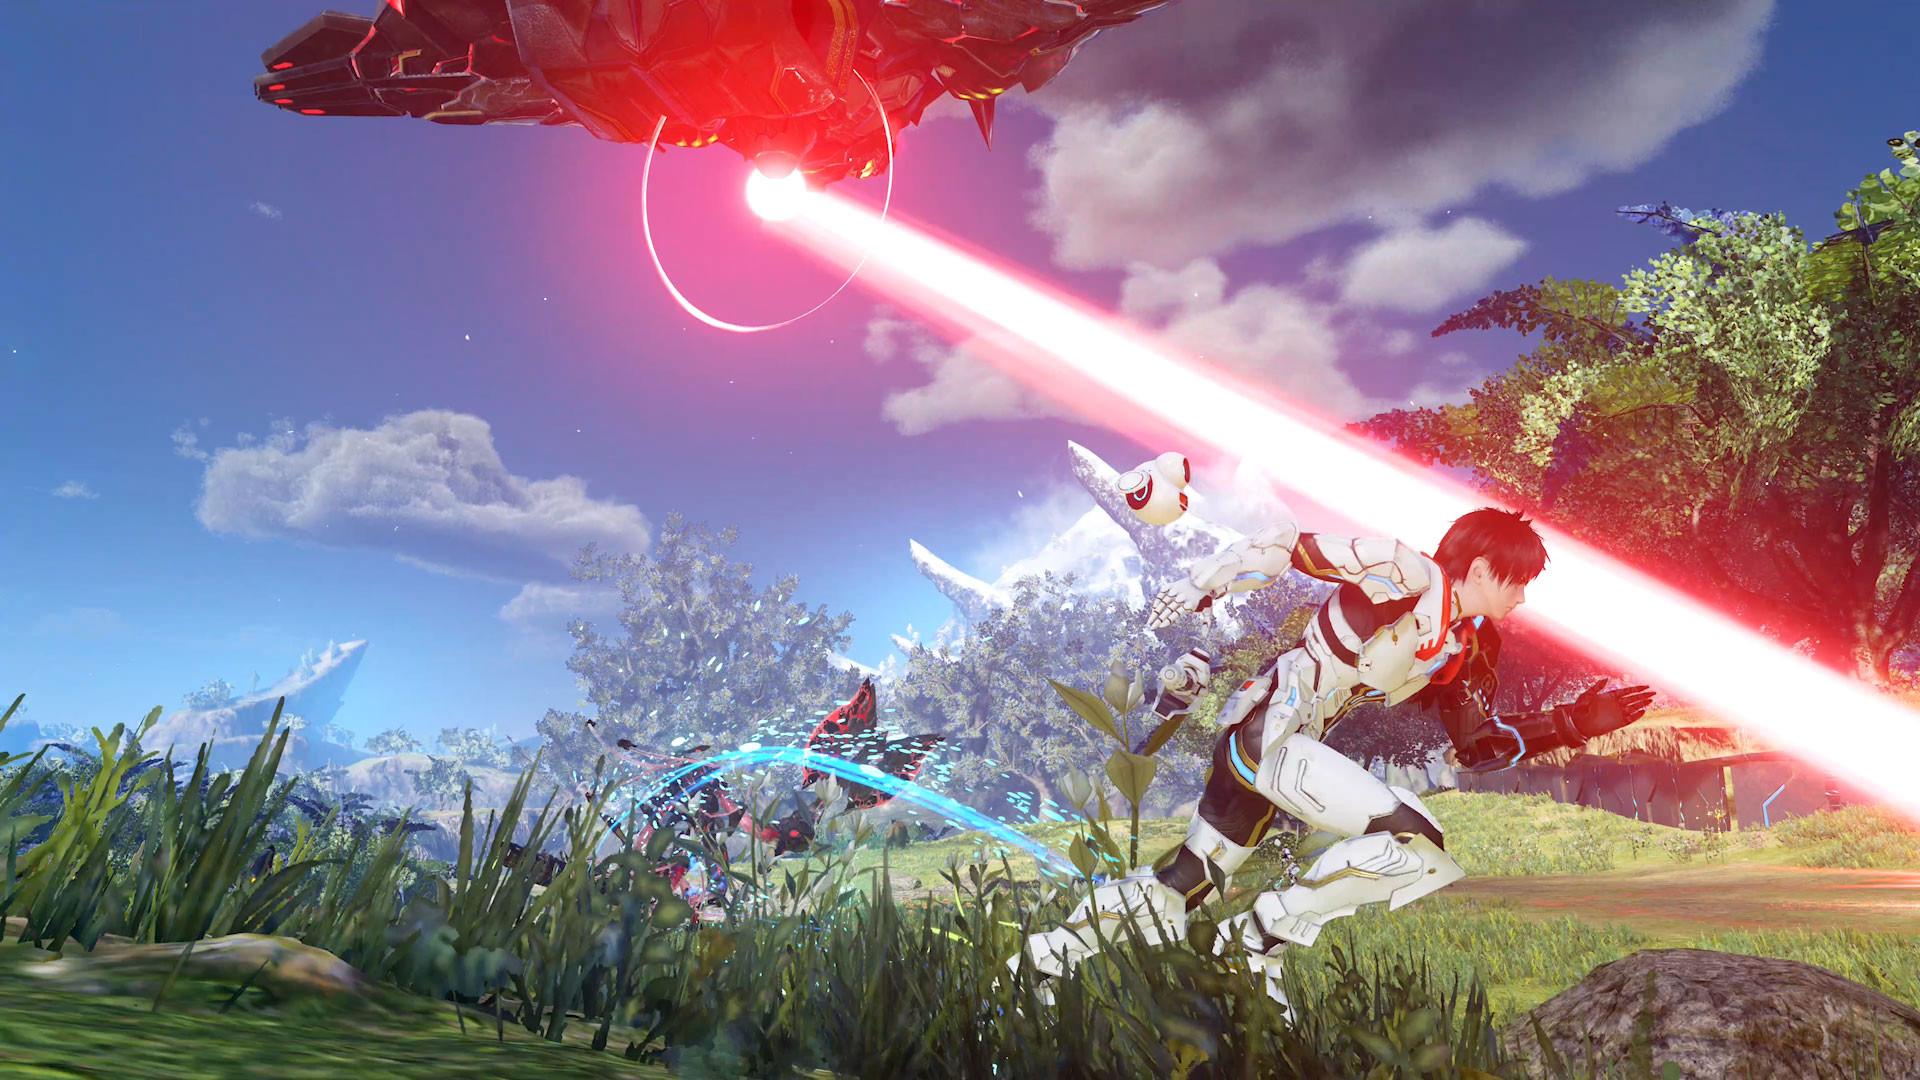 Claim Phantasy Star Online 2 New Genesis for free